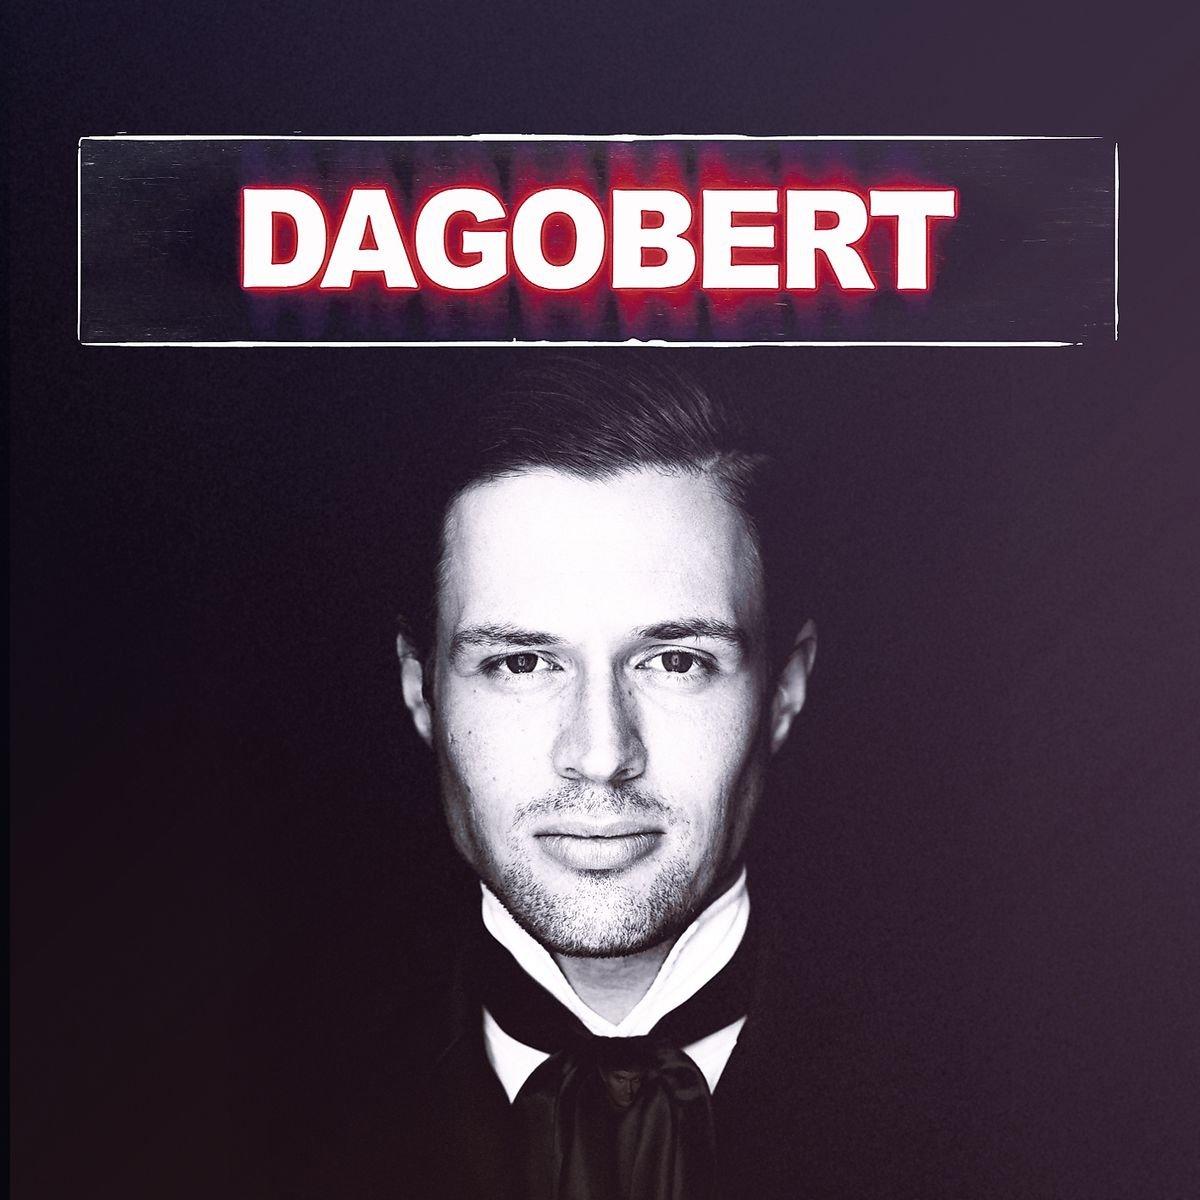 Dagobert                                                                                                                                                                                                                                                                                                                                                                                                <span class=